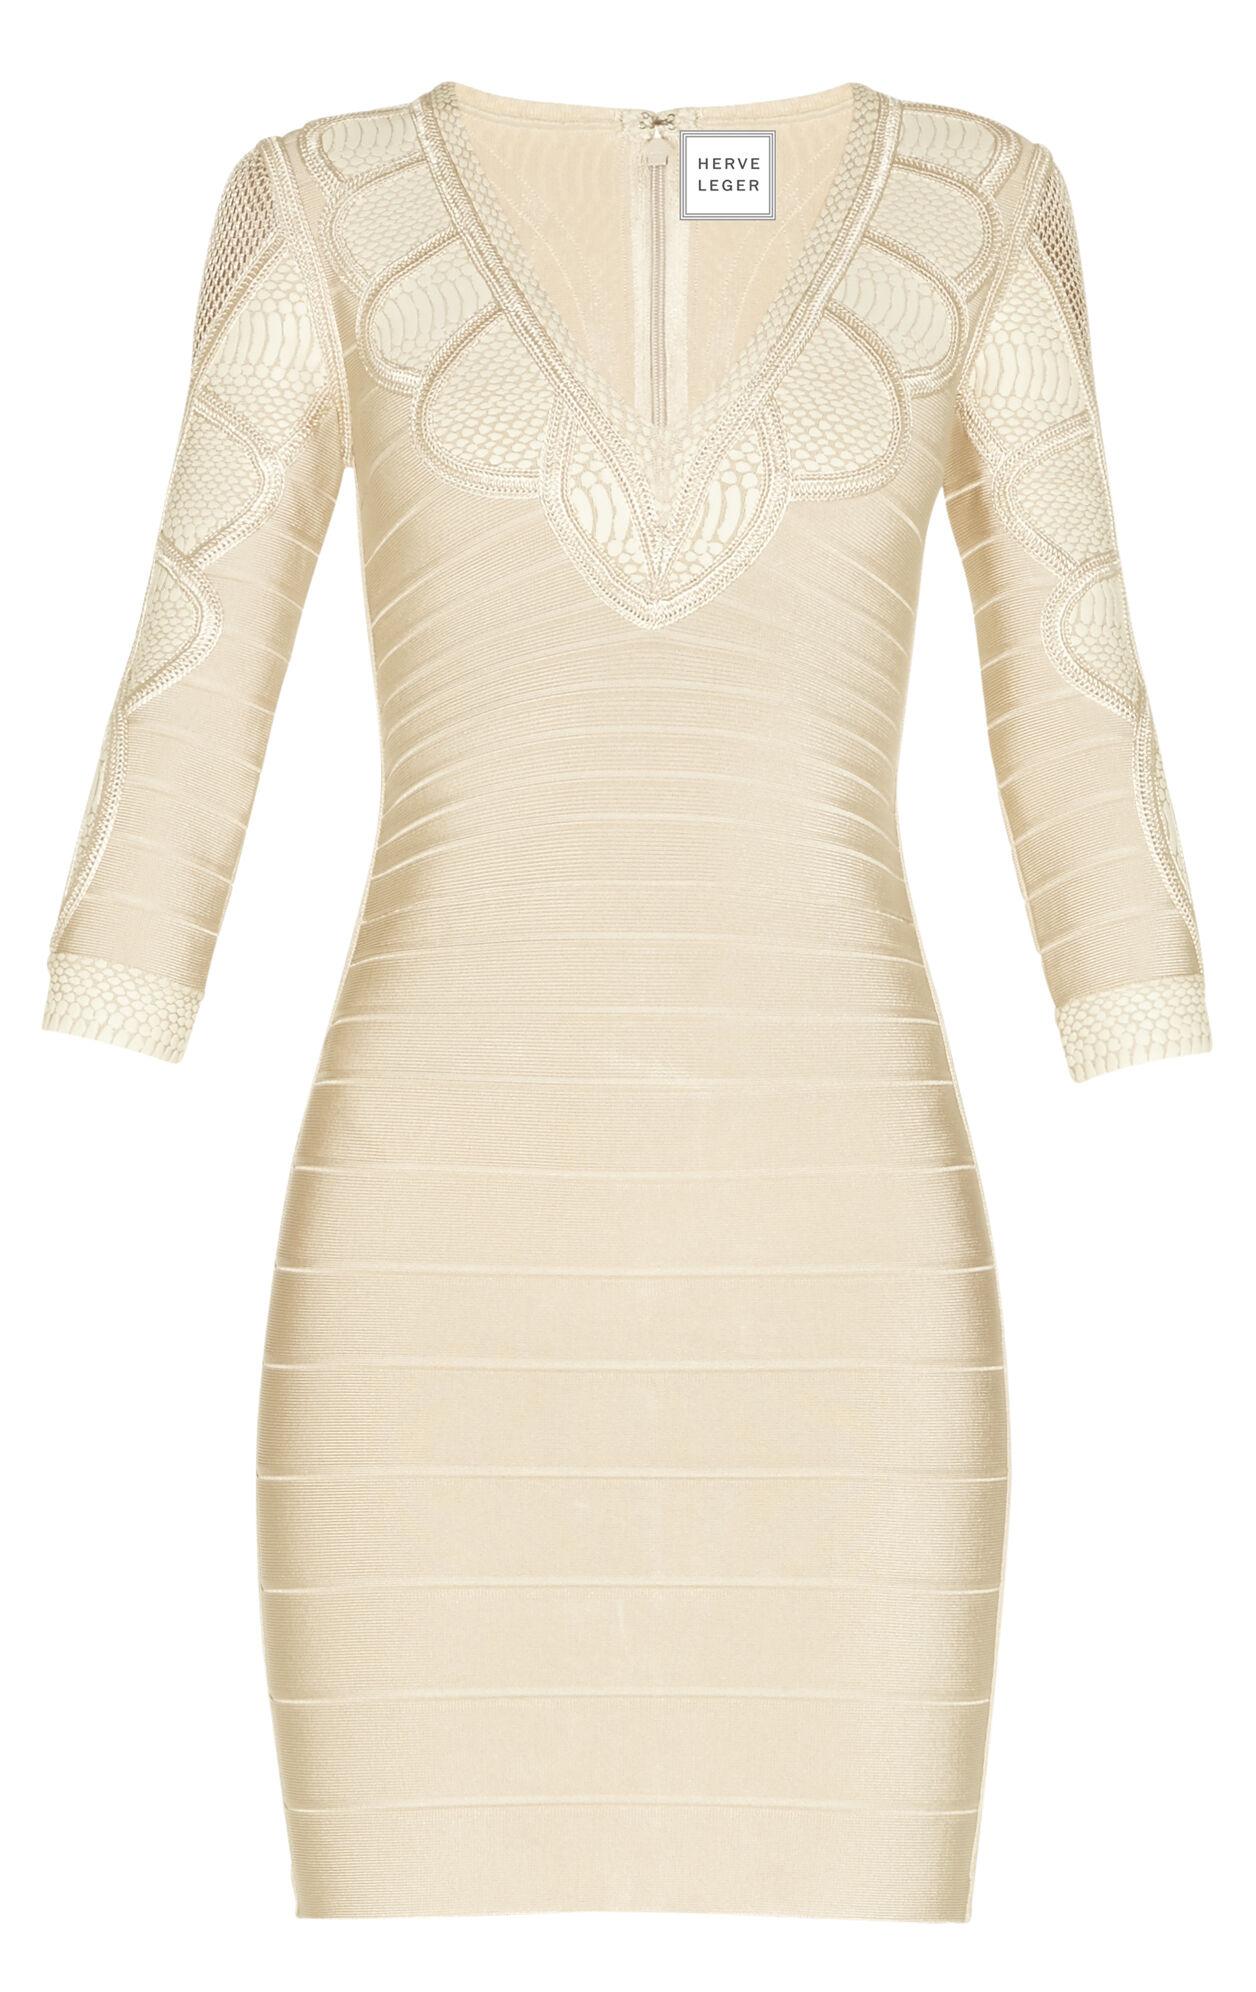 Sofie Puffa Print Crochet Detail Dress